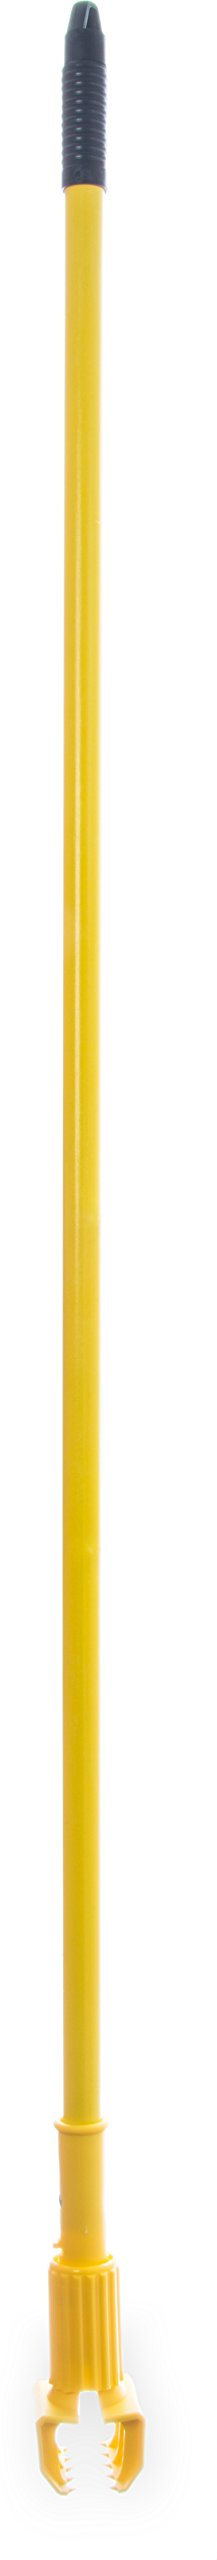 Carlisle 36947504 Commercial Jaw Clamp Fiberglass Wet Mop Handle, 60'', Yellow